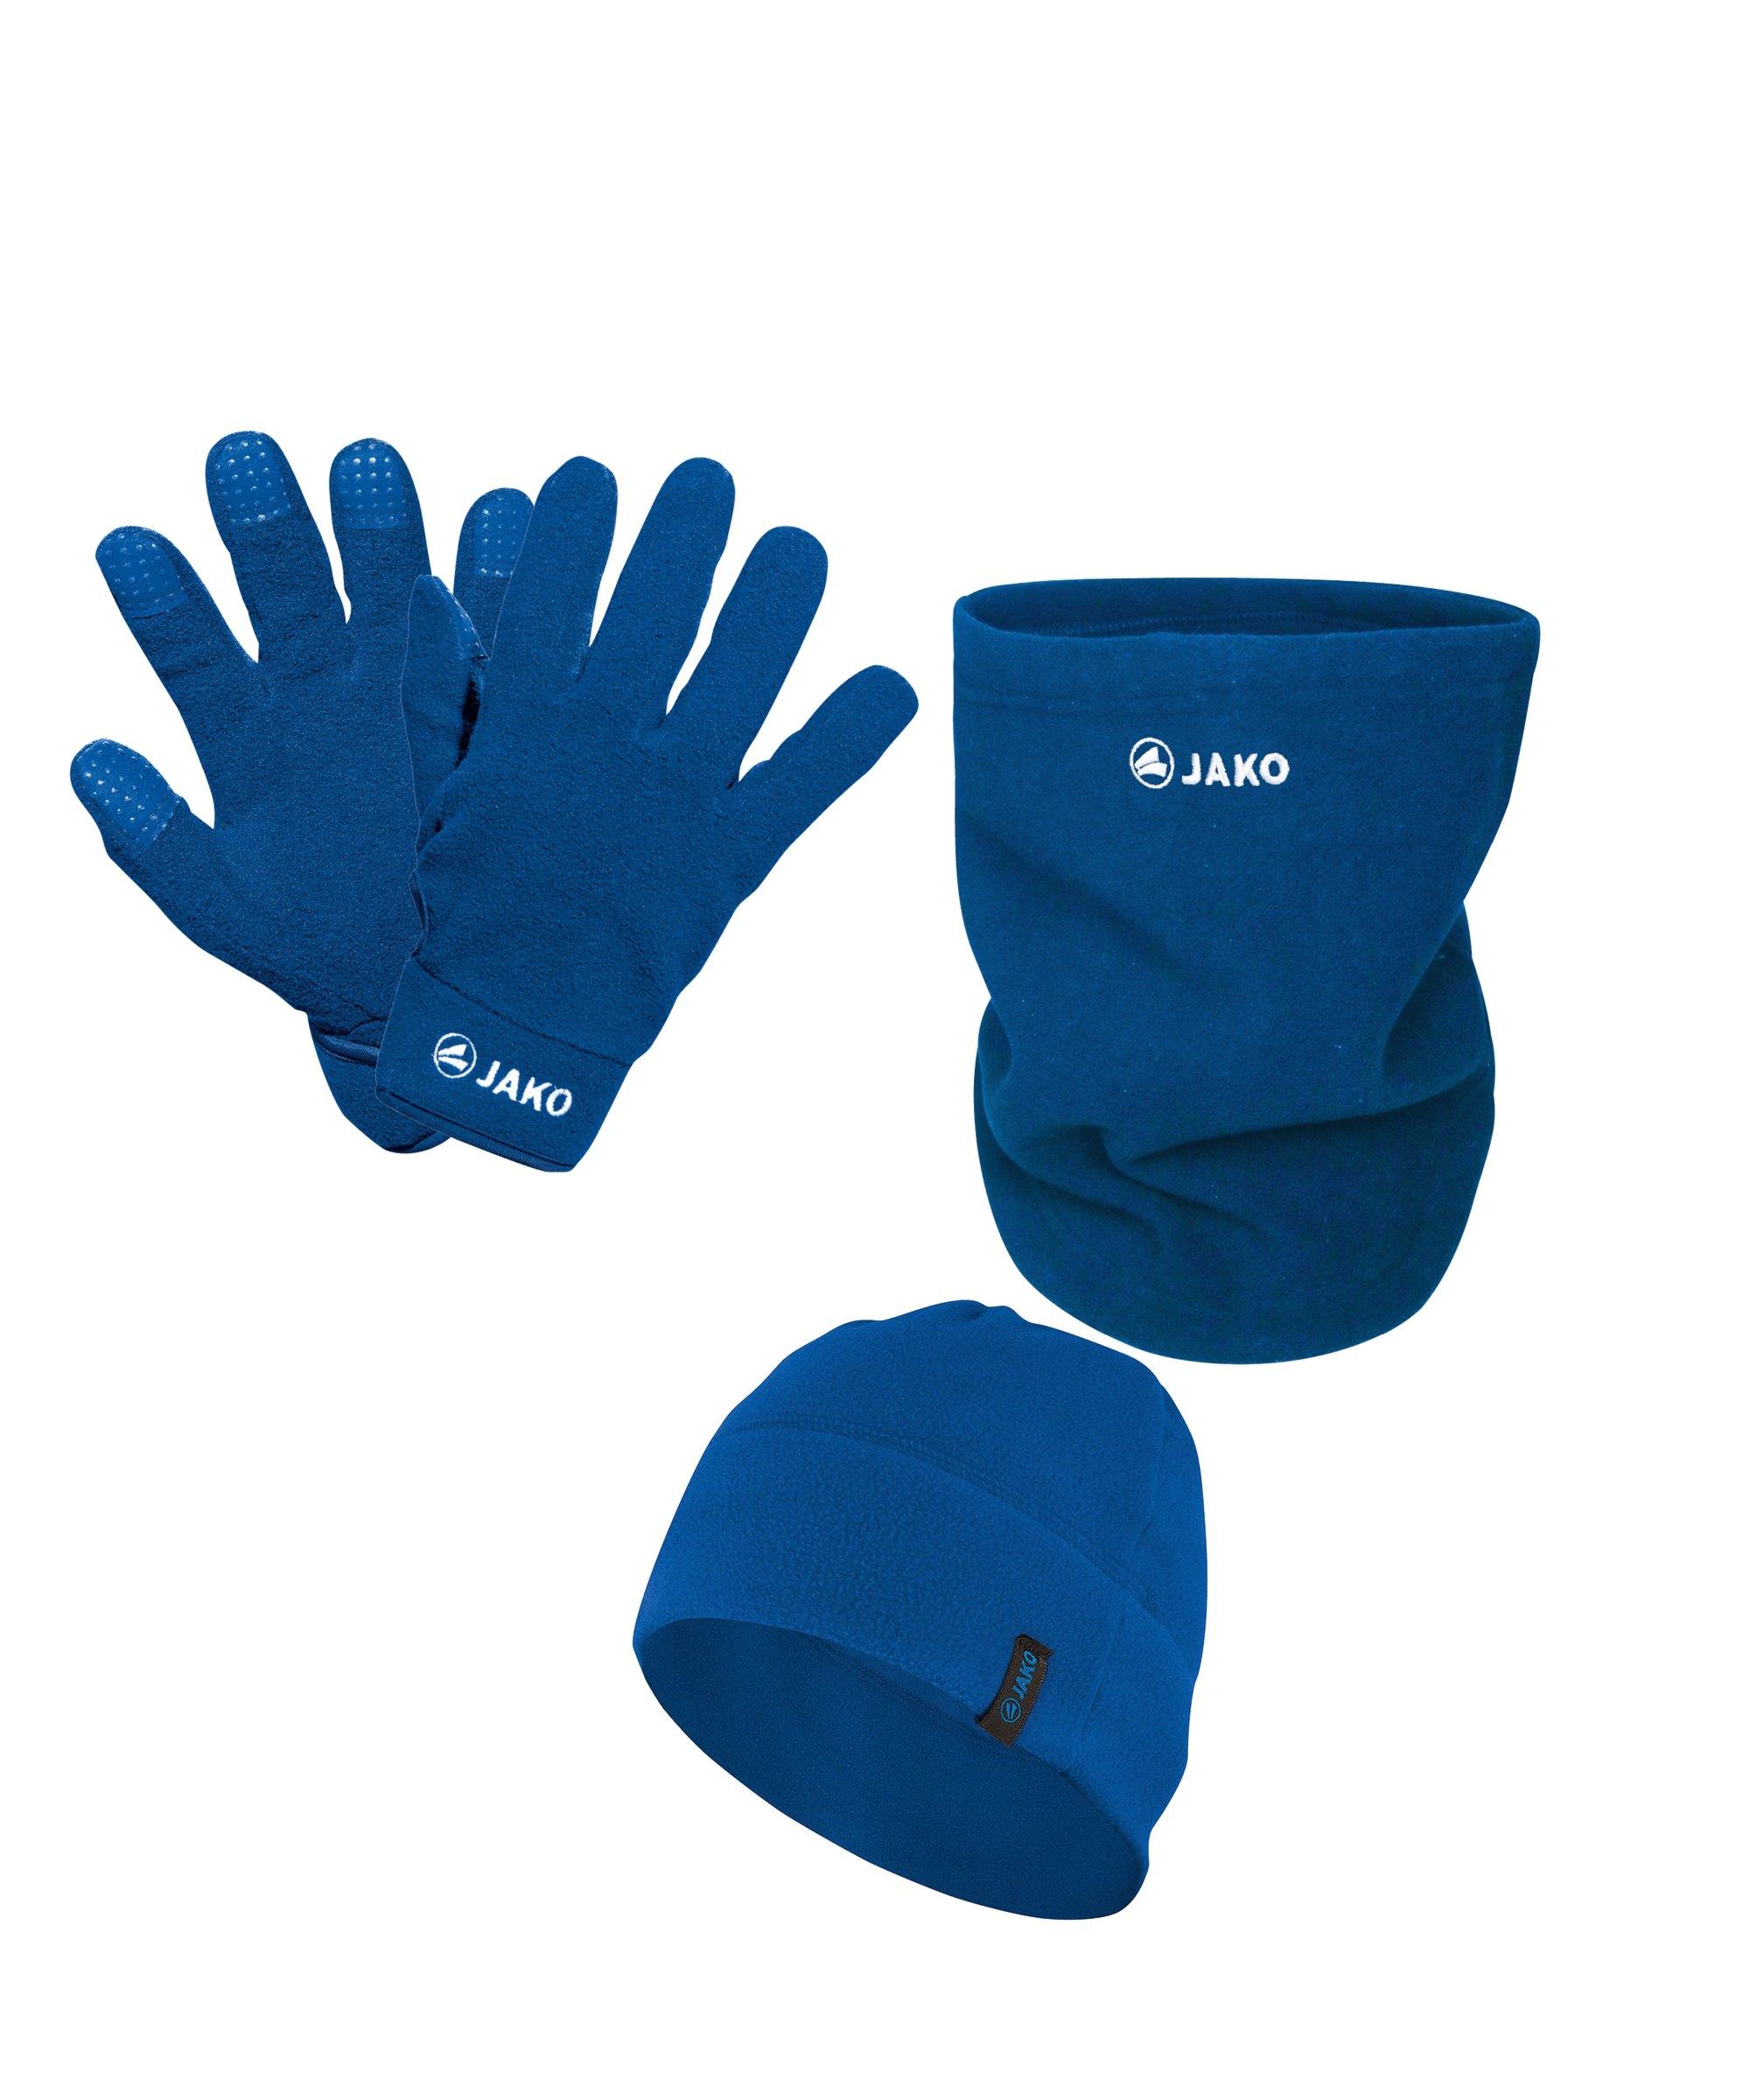 JAKO 3er Winter Set Handschuh + Beanie + Neckwarmer Hellblau - blau